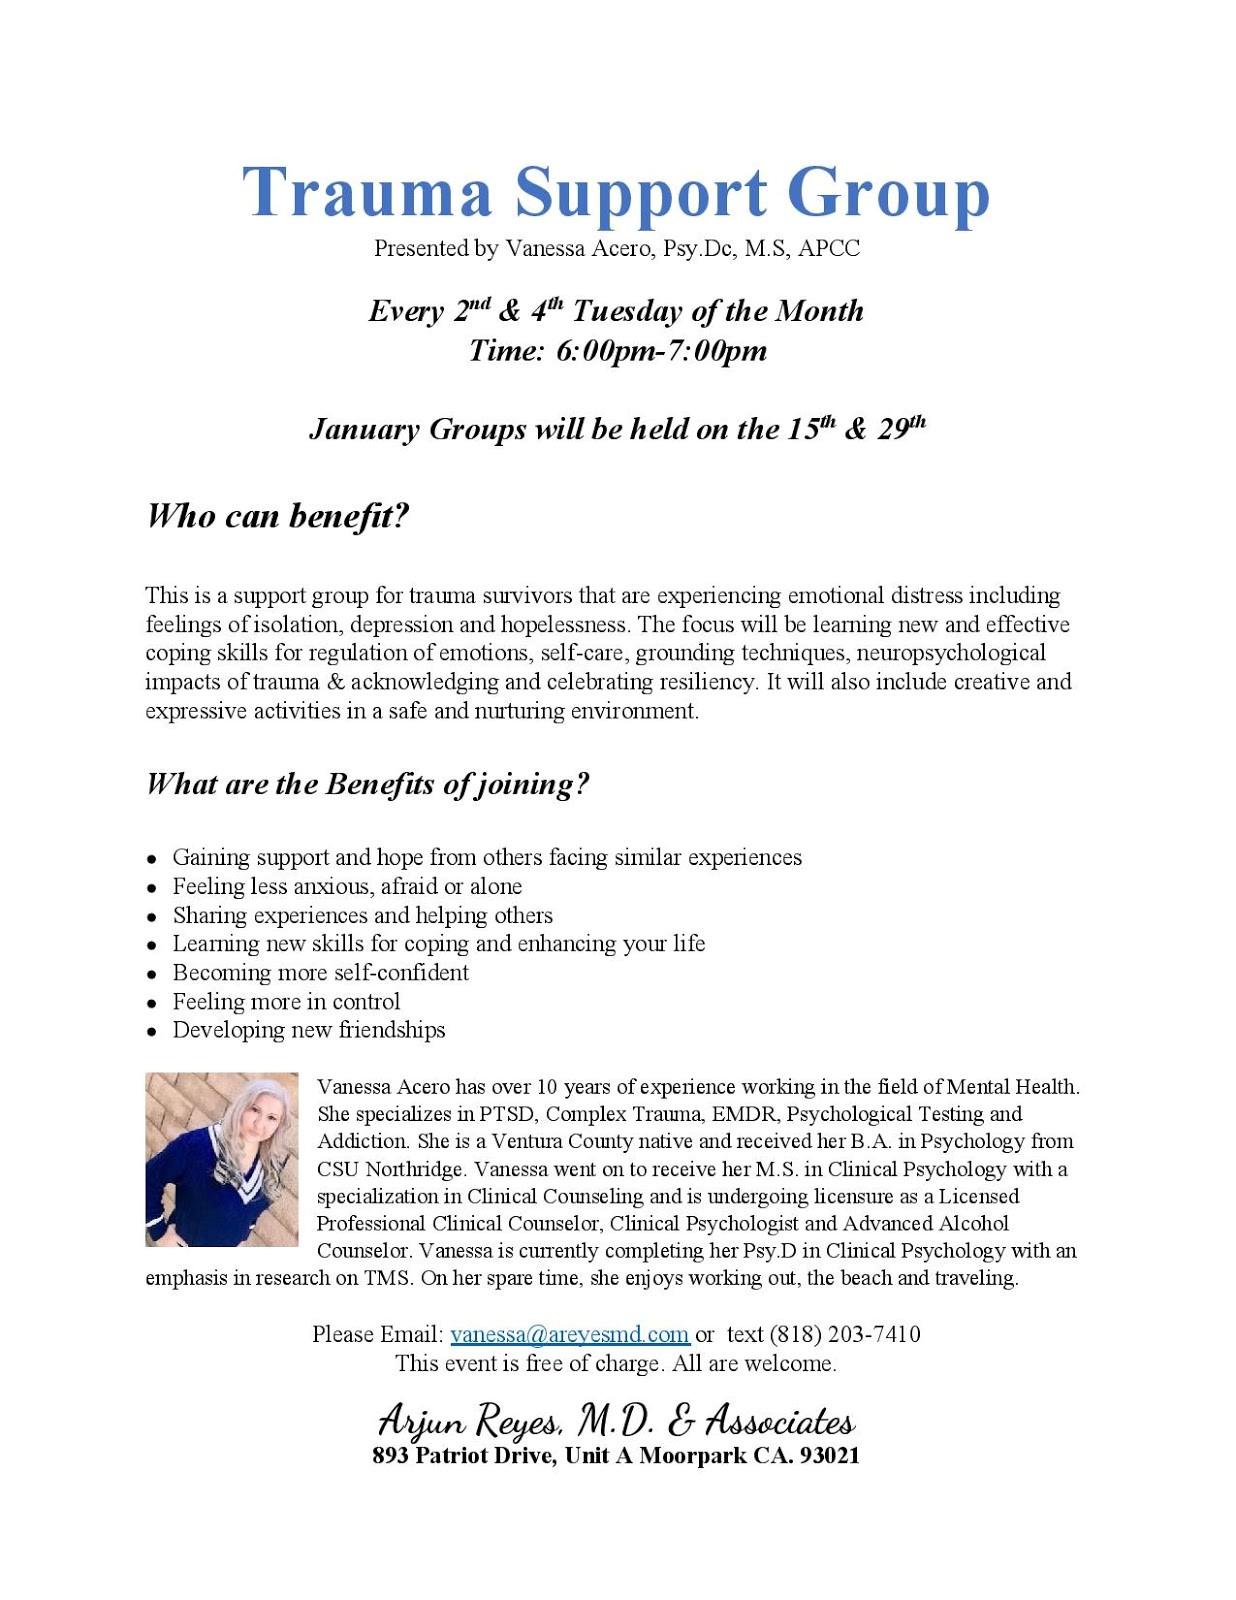 Free Trauma Support Group